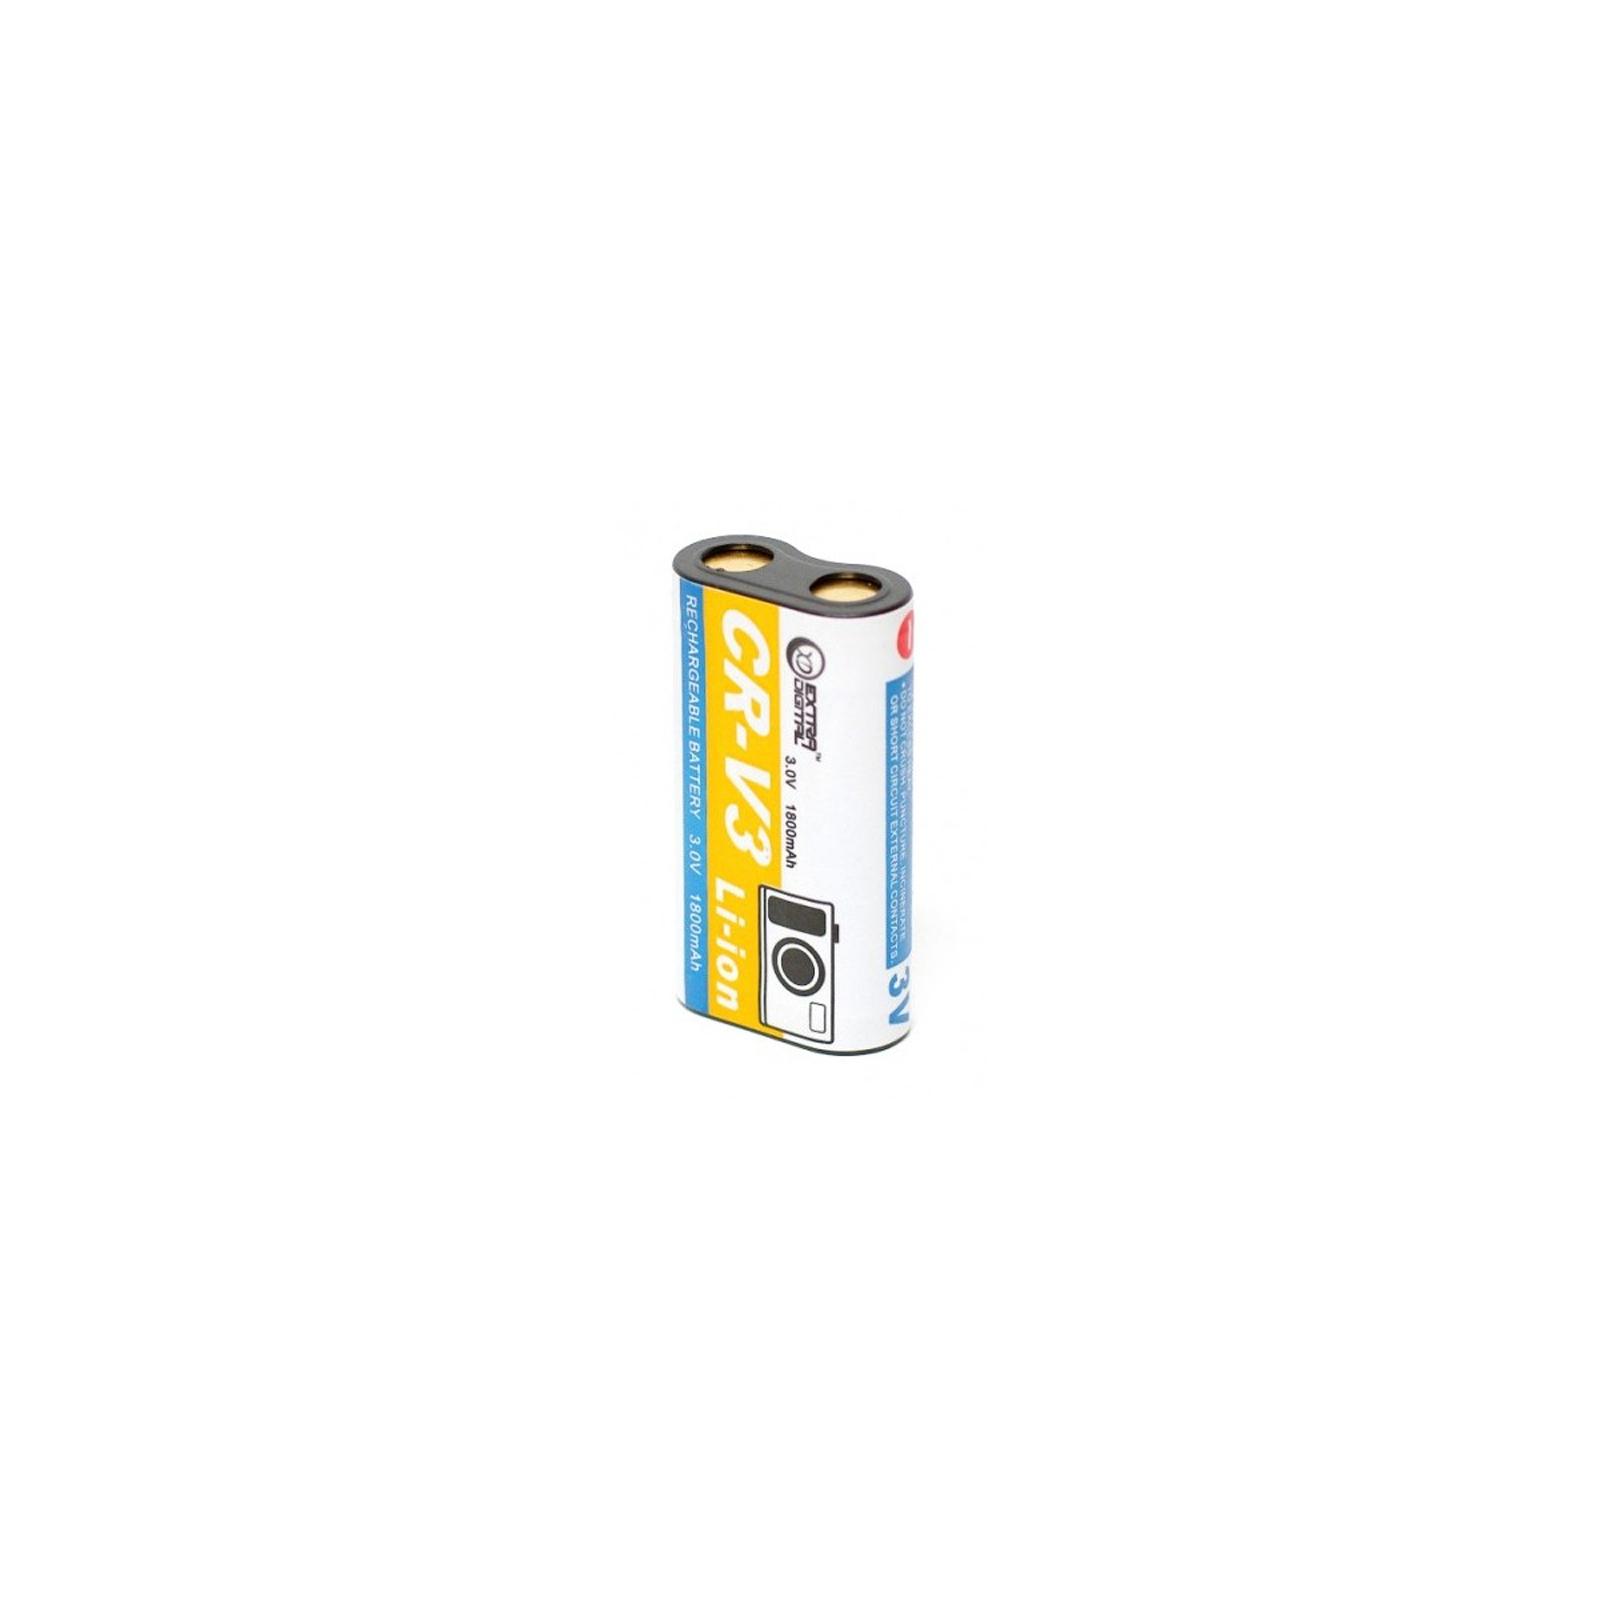 Аккумулятор к фото/видео EXTRADIGITAL Olympus LI-O1B (DV00DV1072) изображение 2